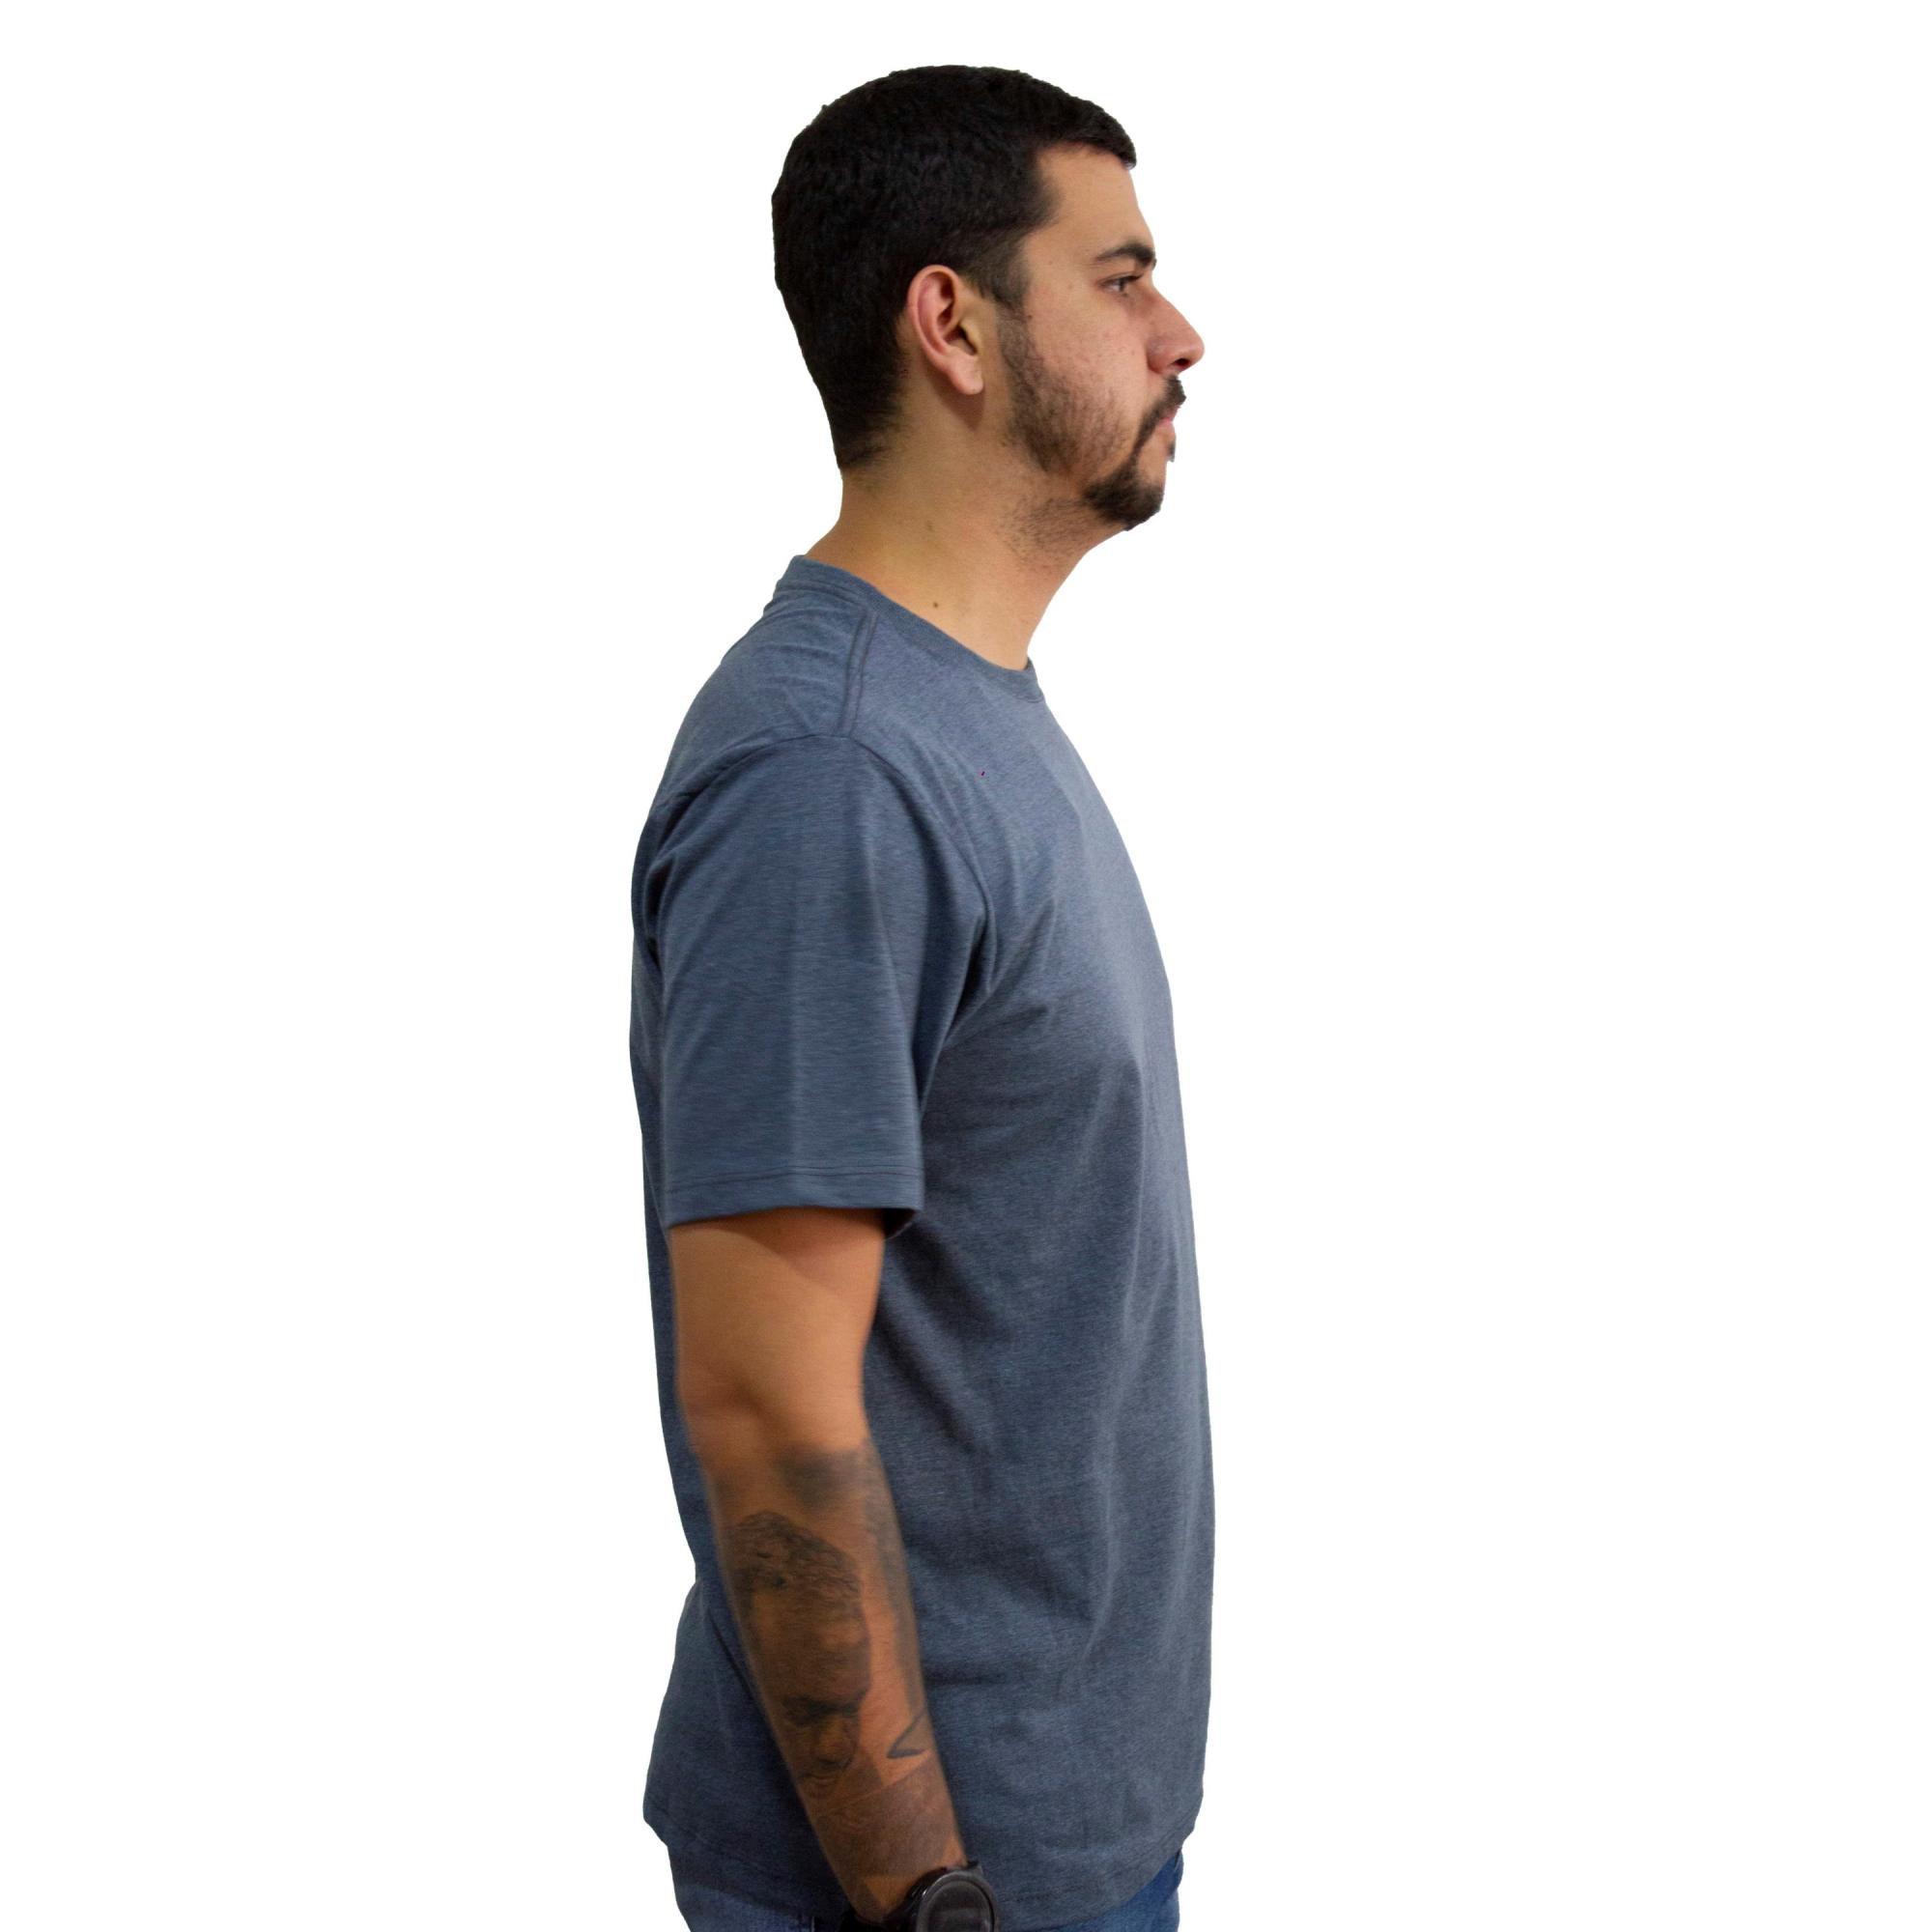 Camiseta Hurley Silk Mini Mescla Escuro